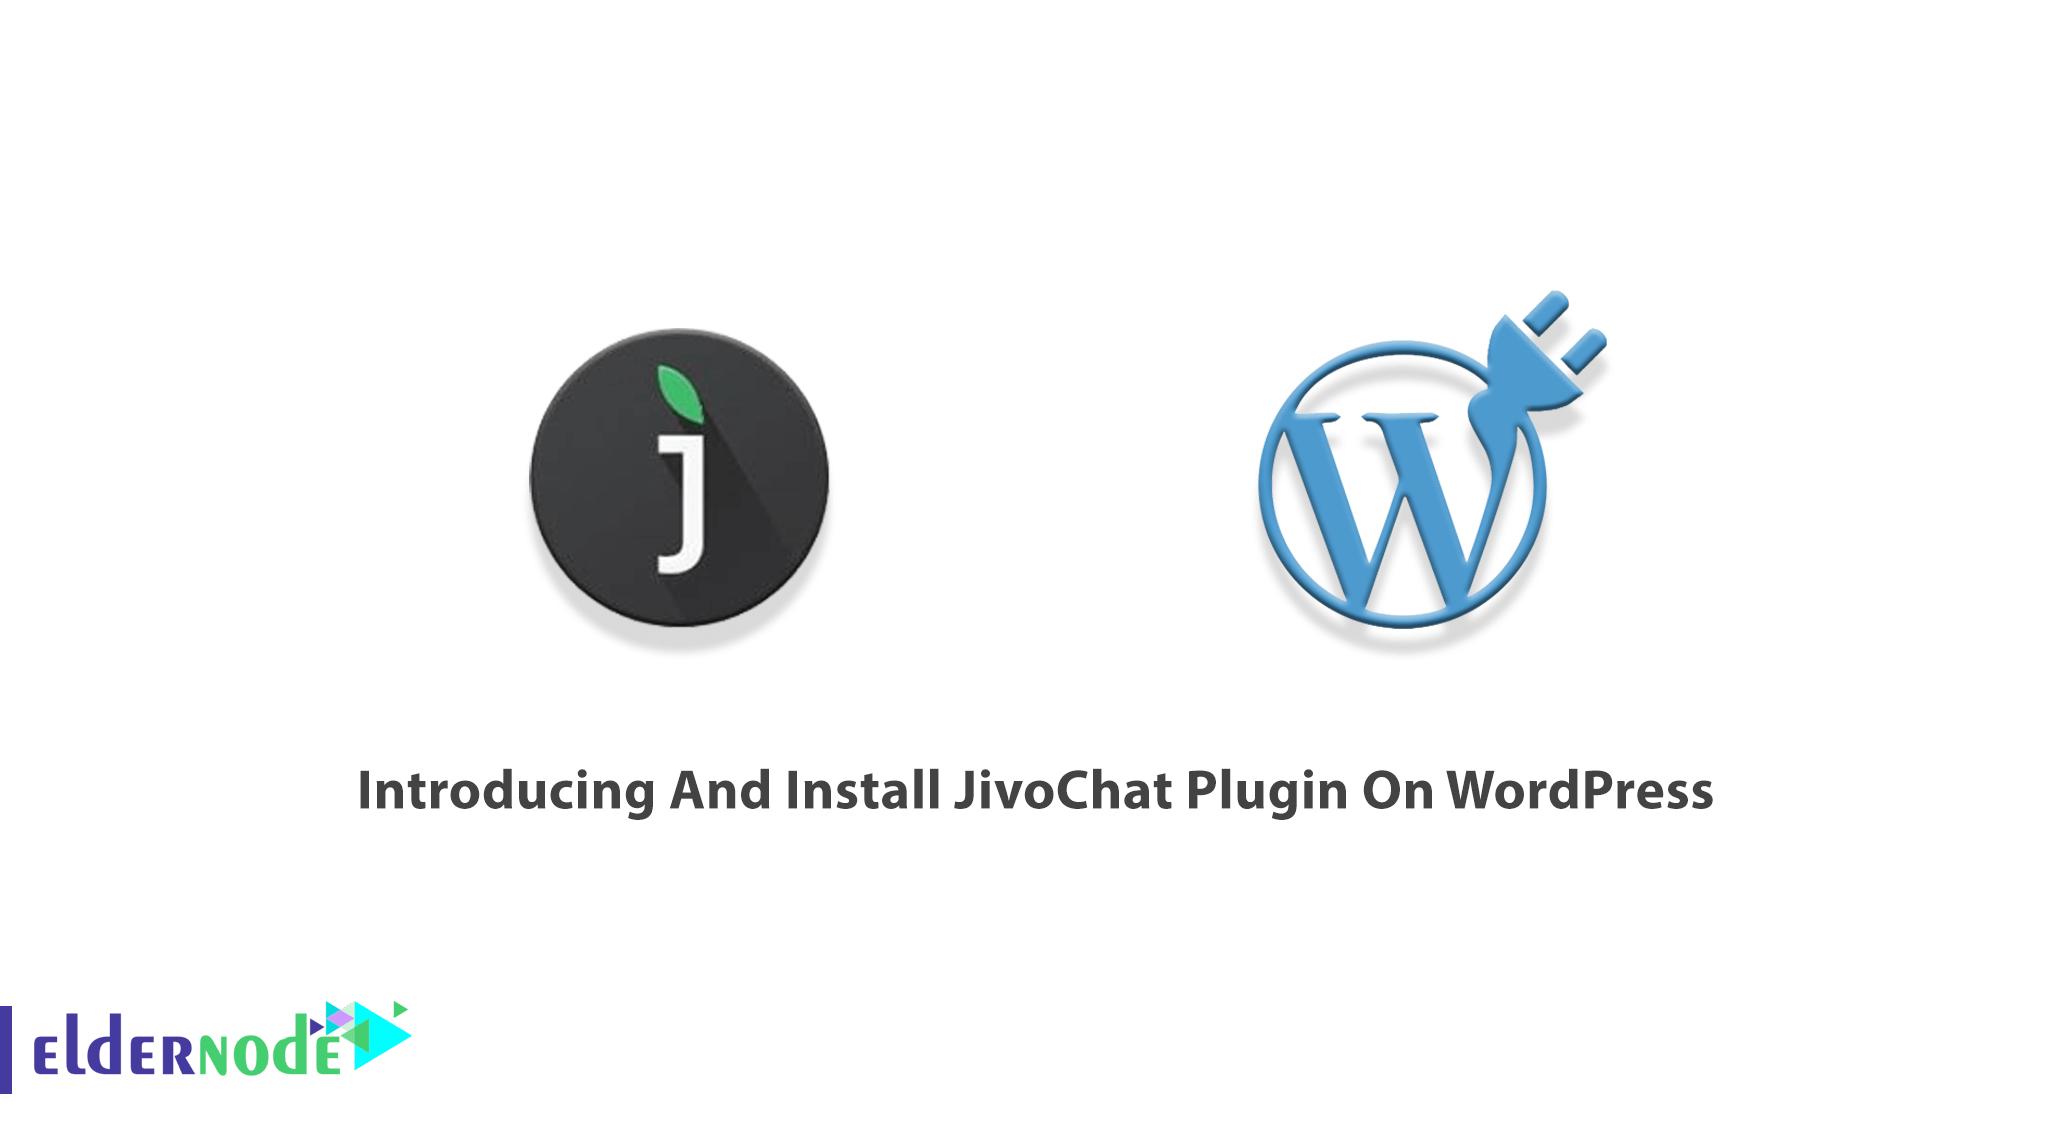 Introducing And Install JivoChat Plugin On WordPress